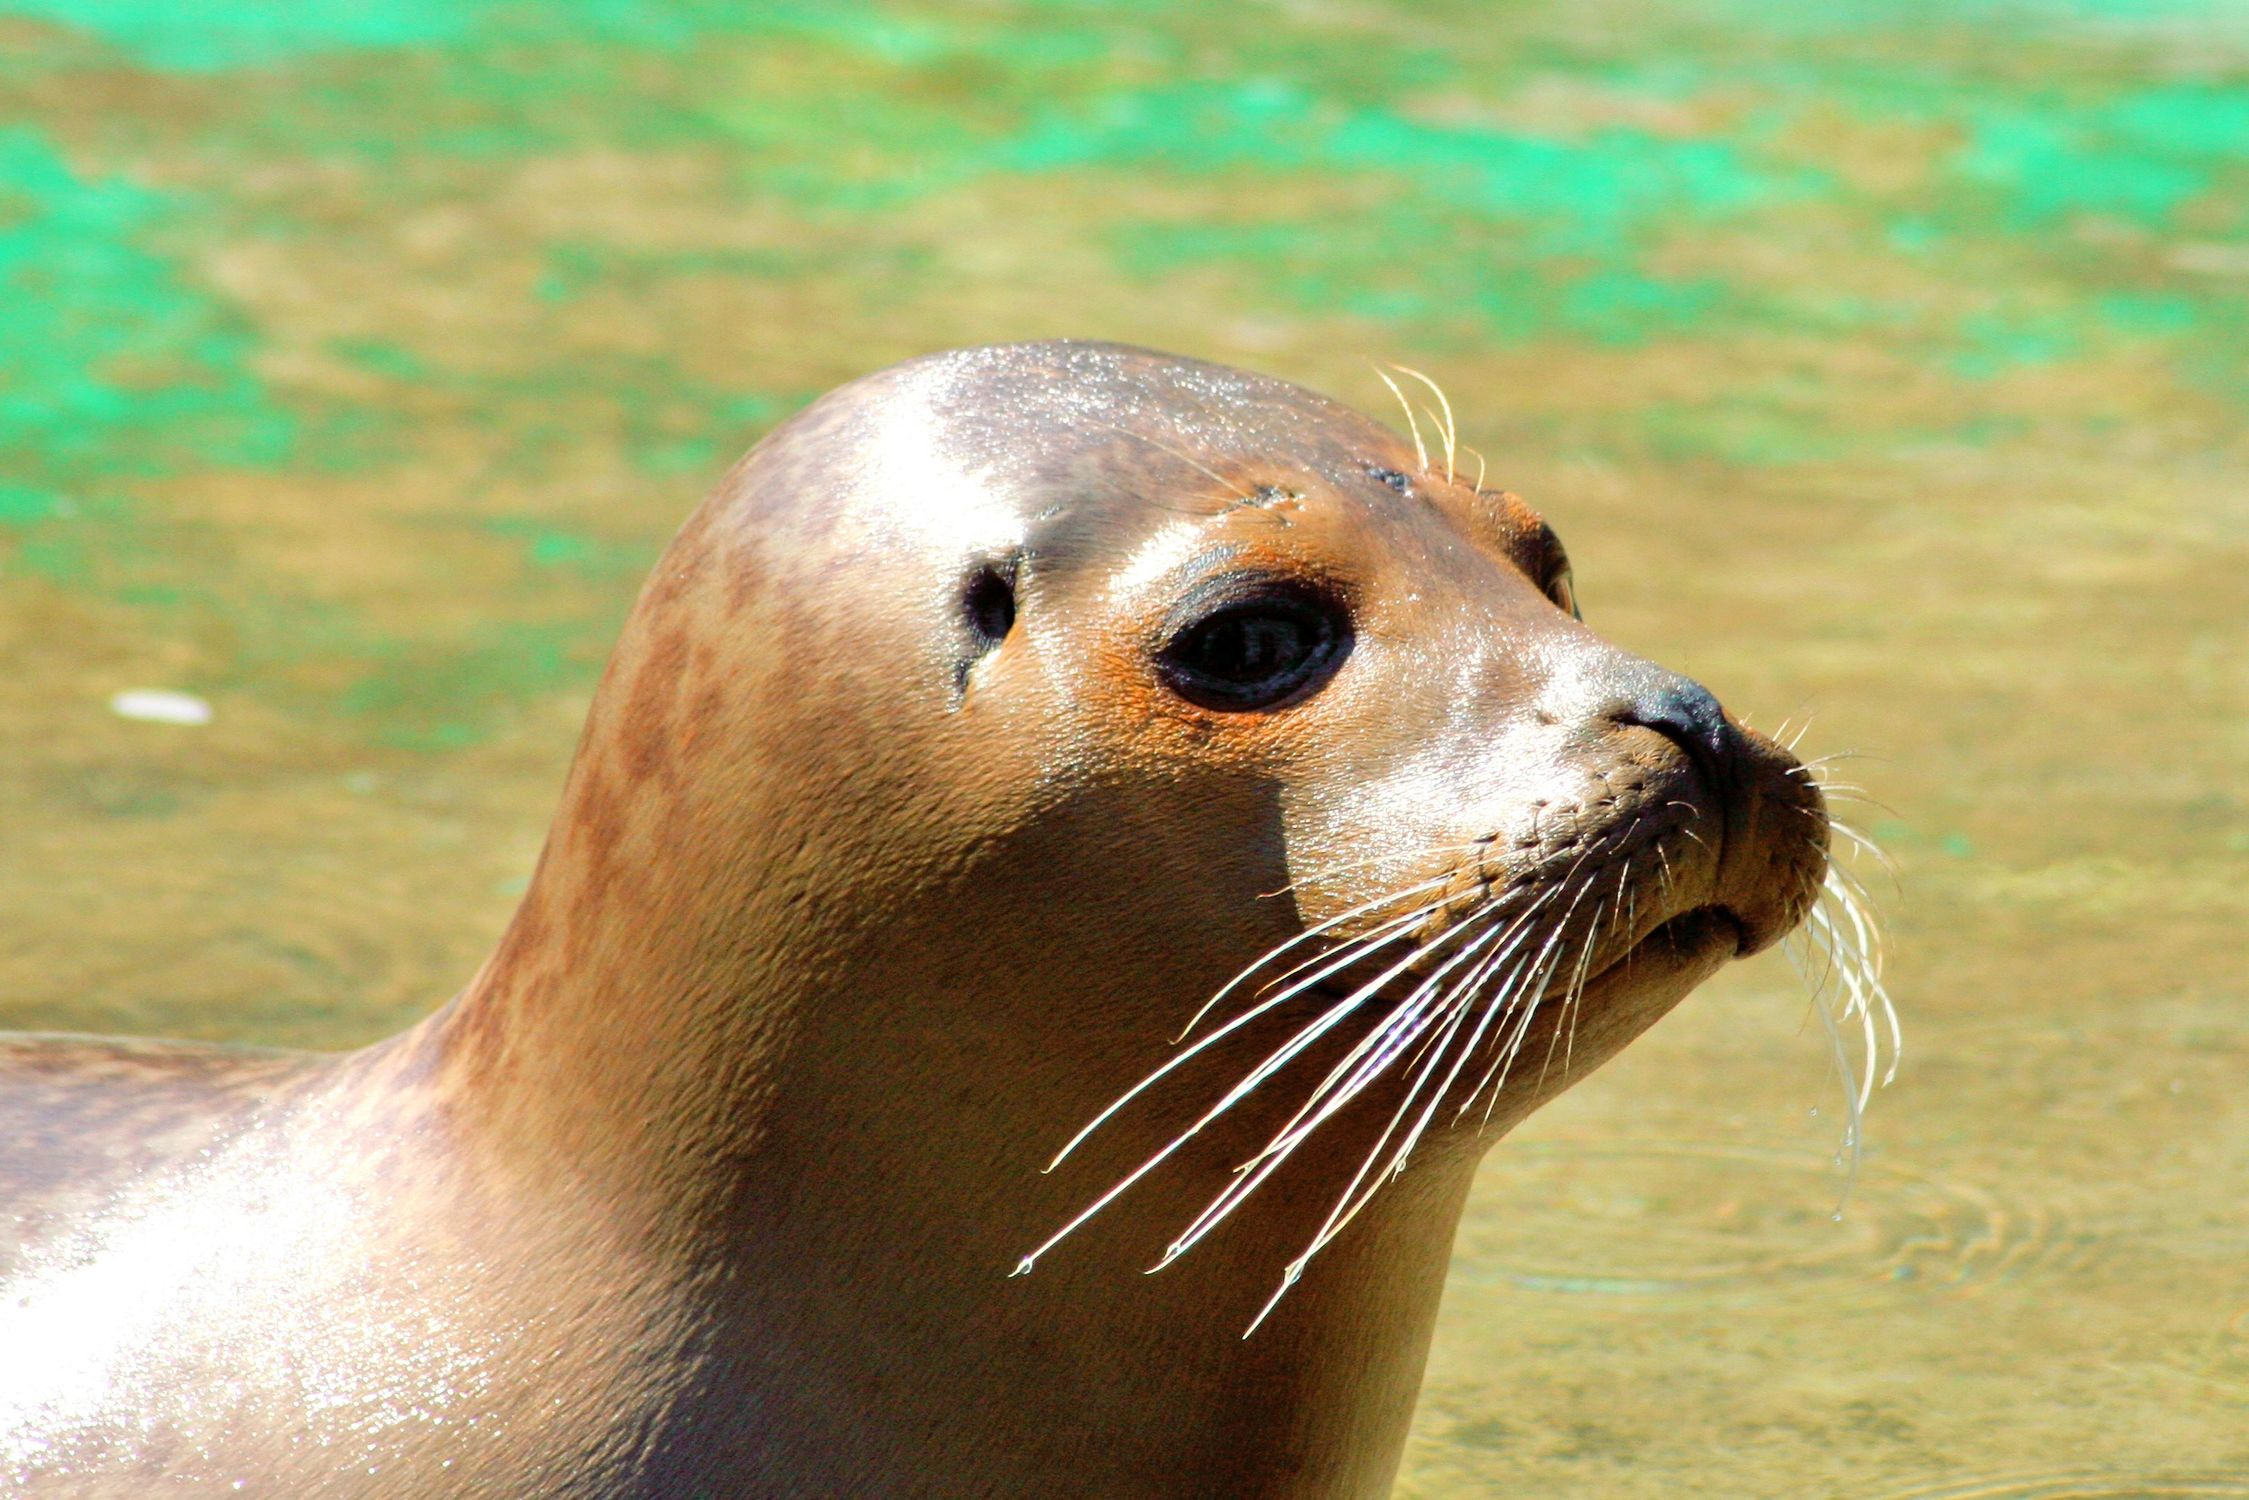 Bild mit Tiere, Säugetiere, Robben, Seehunde, Seelöwen, Seeblöwen